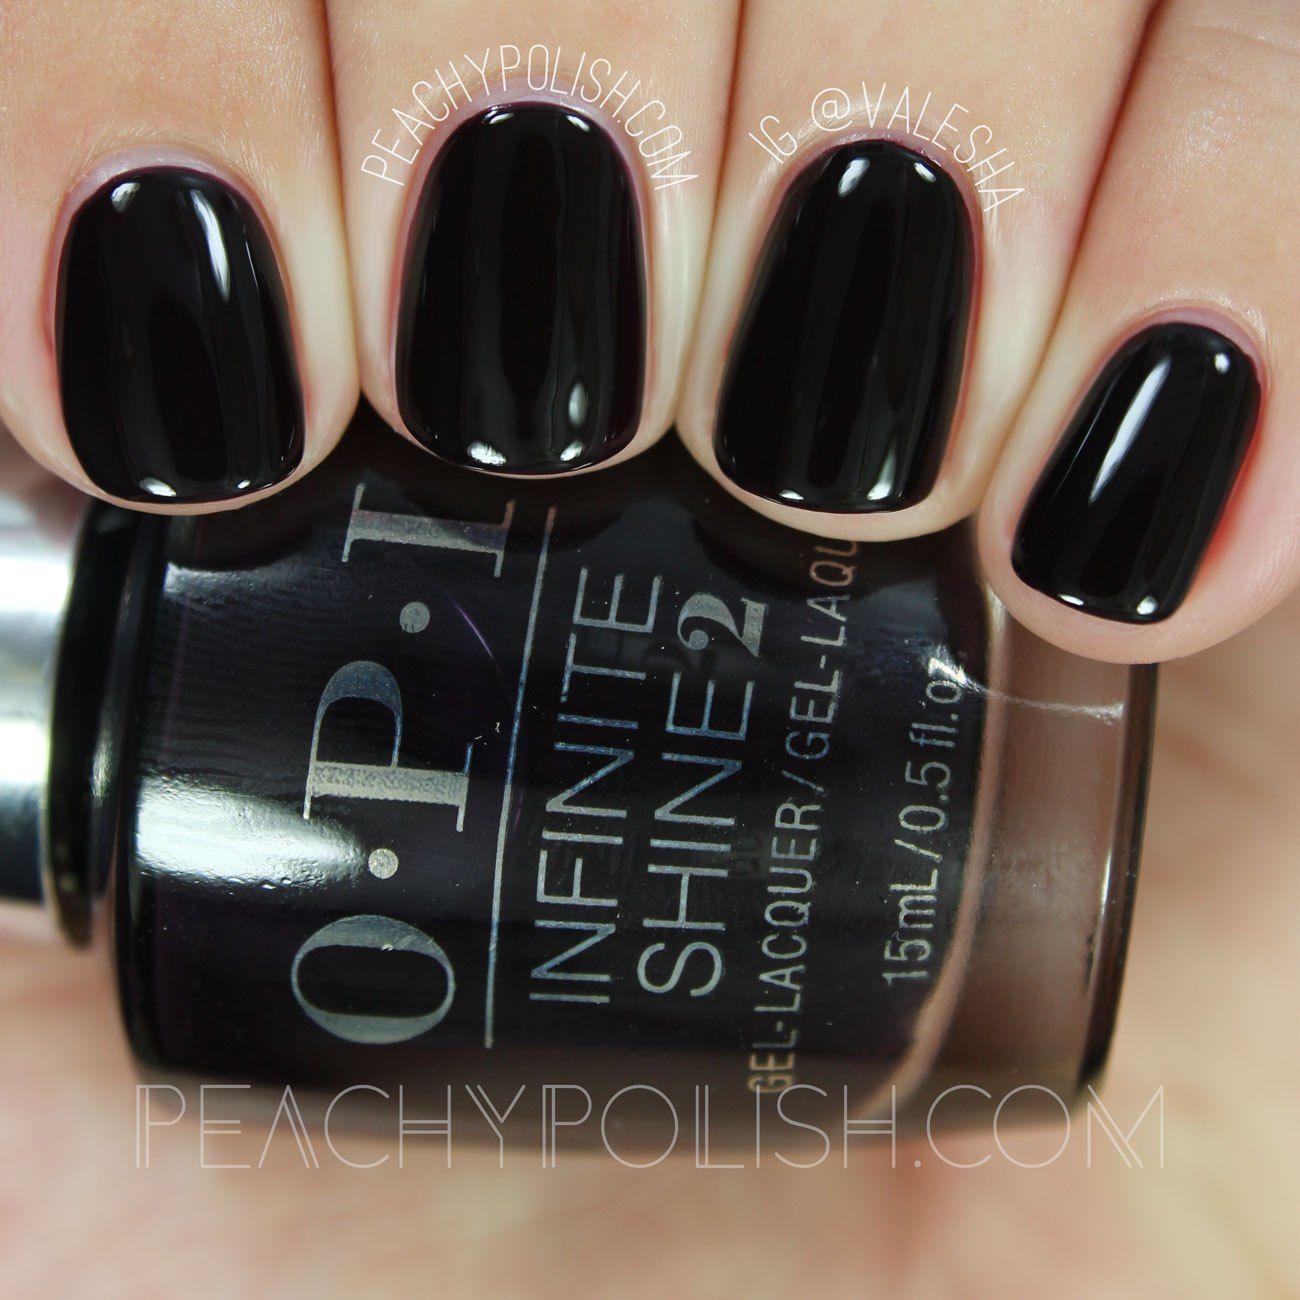 Opi Infinite Shine Iconic Collection Swatches Review Opi Gel Nails Opi Nail Polish Colors Nail Polish